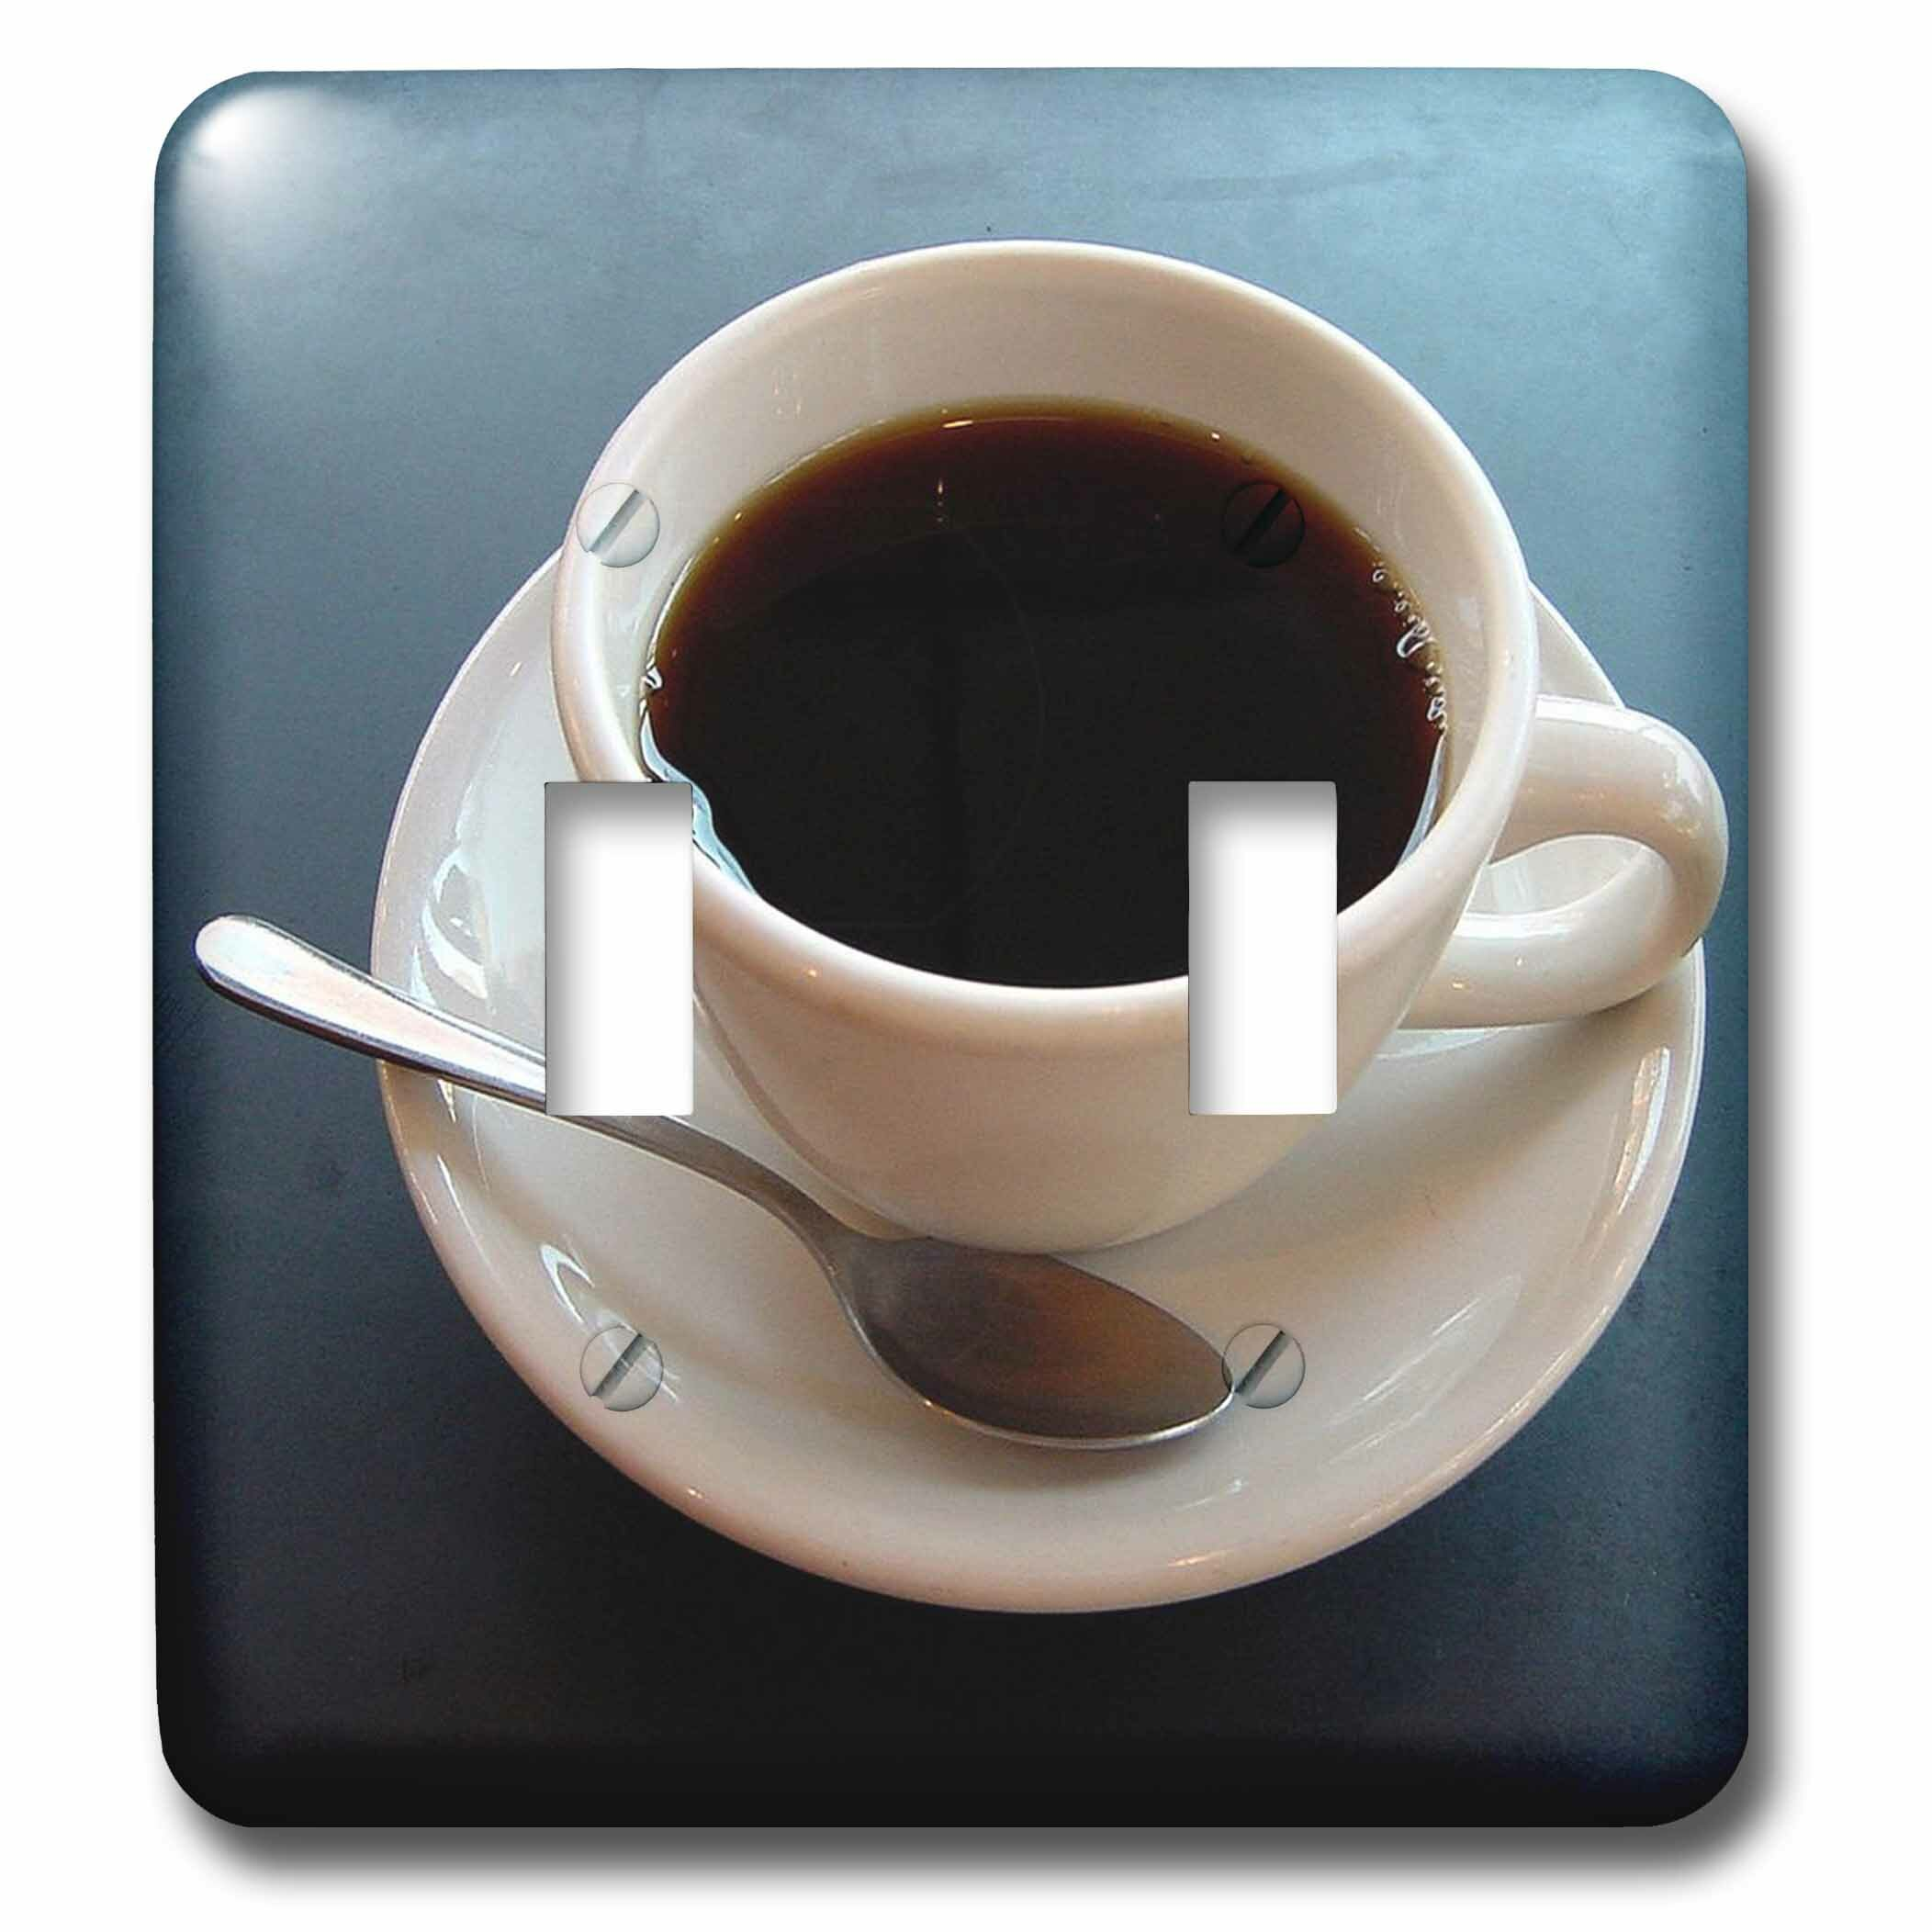 3drose Coffee Cup 2 Gang Toggle Light Switch Wall Plate Wayfair